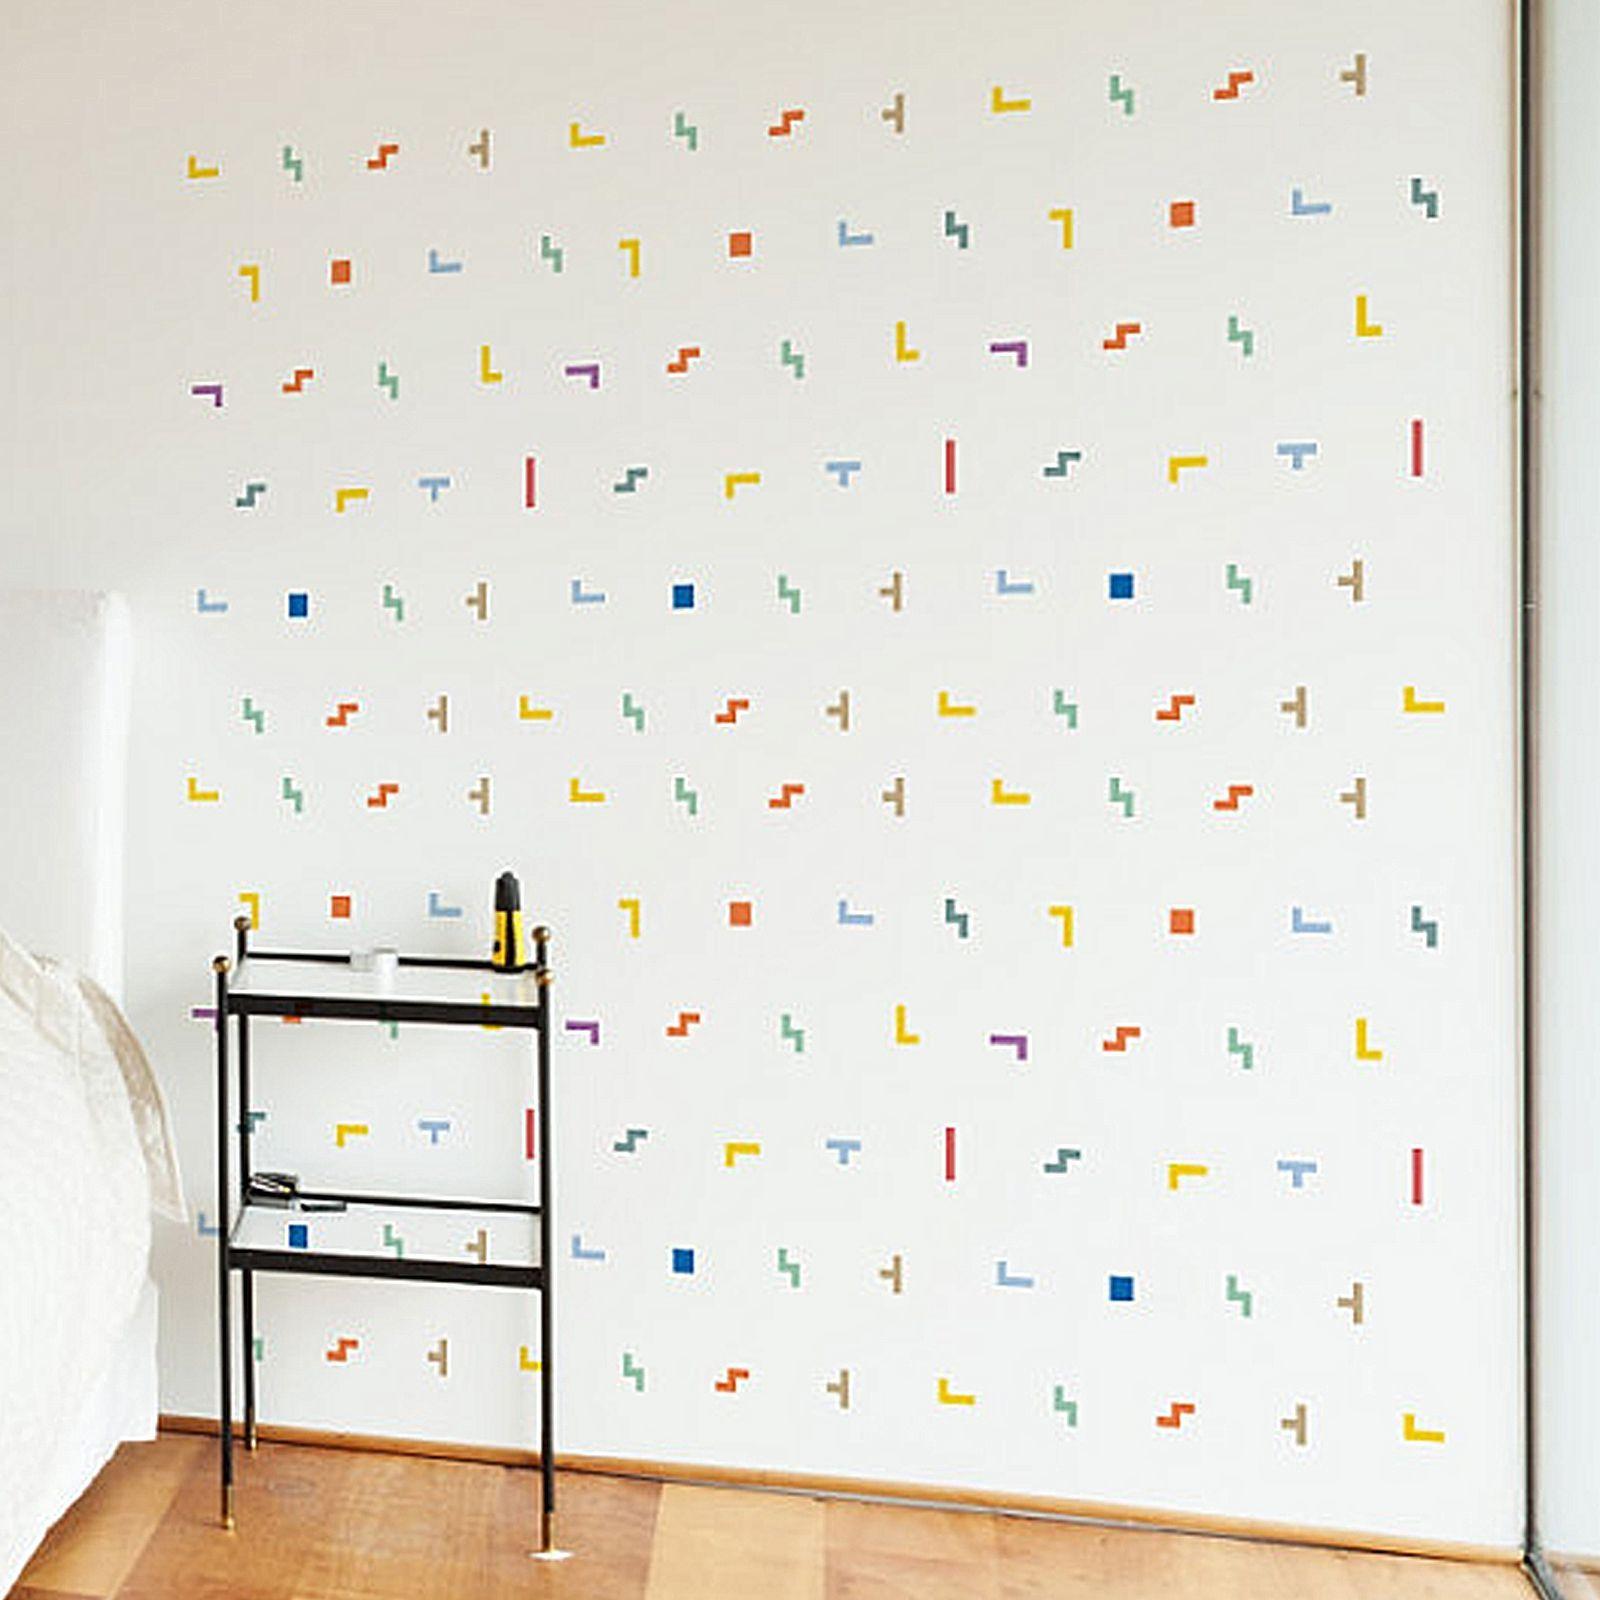 Little studio 8 bit blocks wall decal set of 140 by little little studio 8 bit blocks wall decal set of 140 by little sticker boy amipublicfo Images